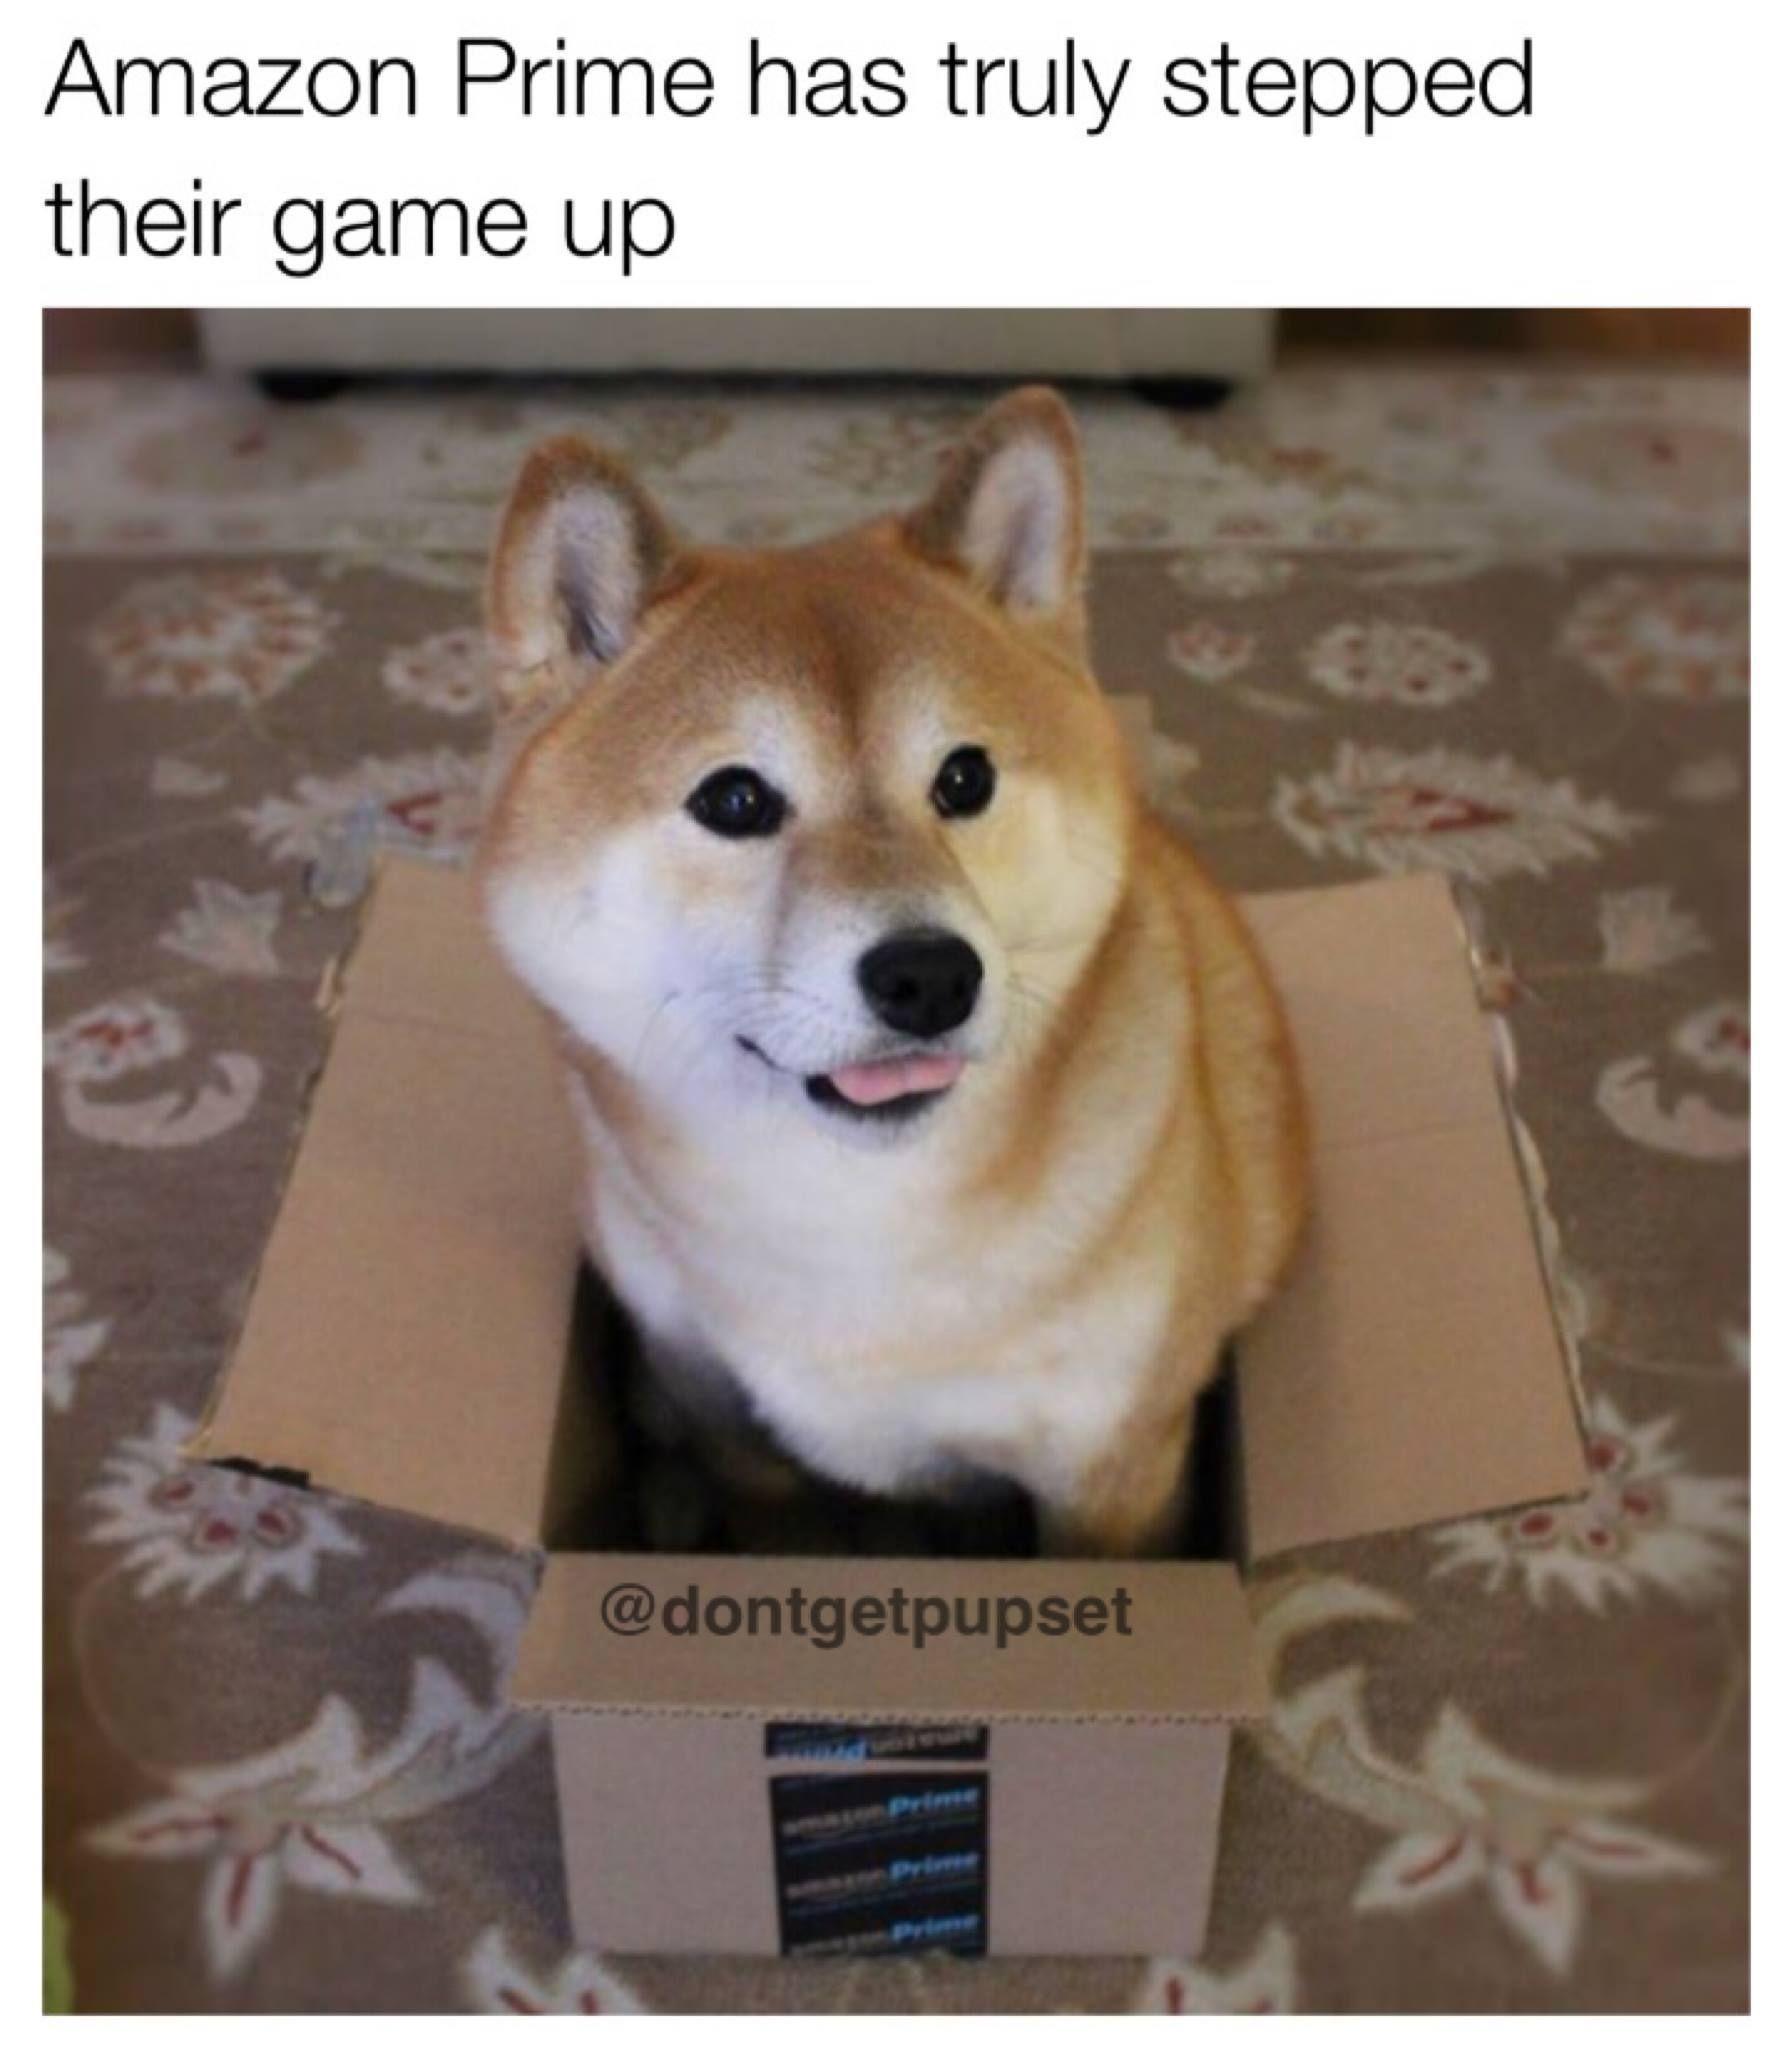 Amazon Prime Really Stepped Up Their Game I Ll Take 37 Of These Shiba Inu Shiba Inu Dog Dog Memes